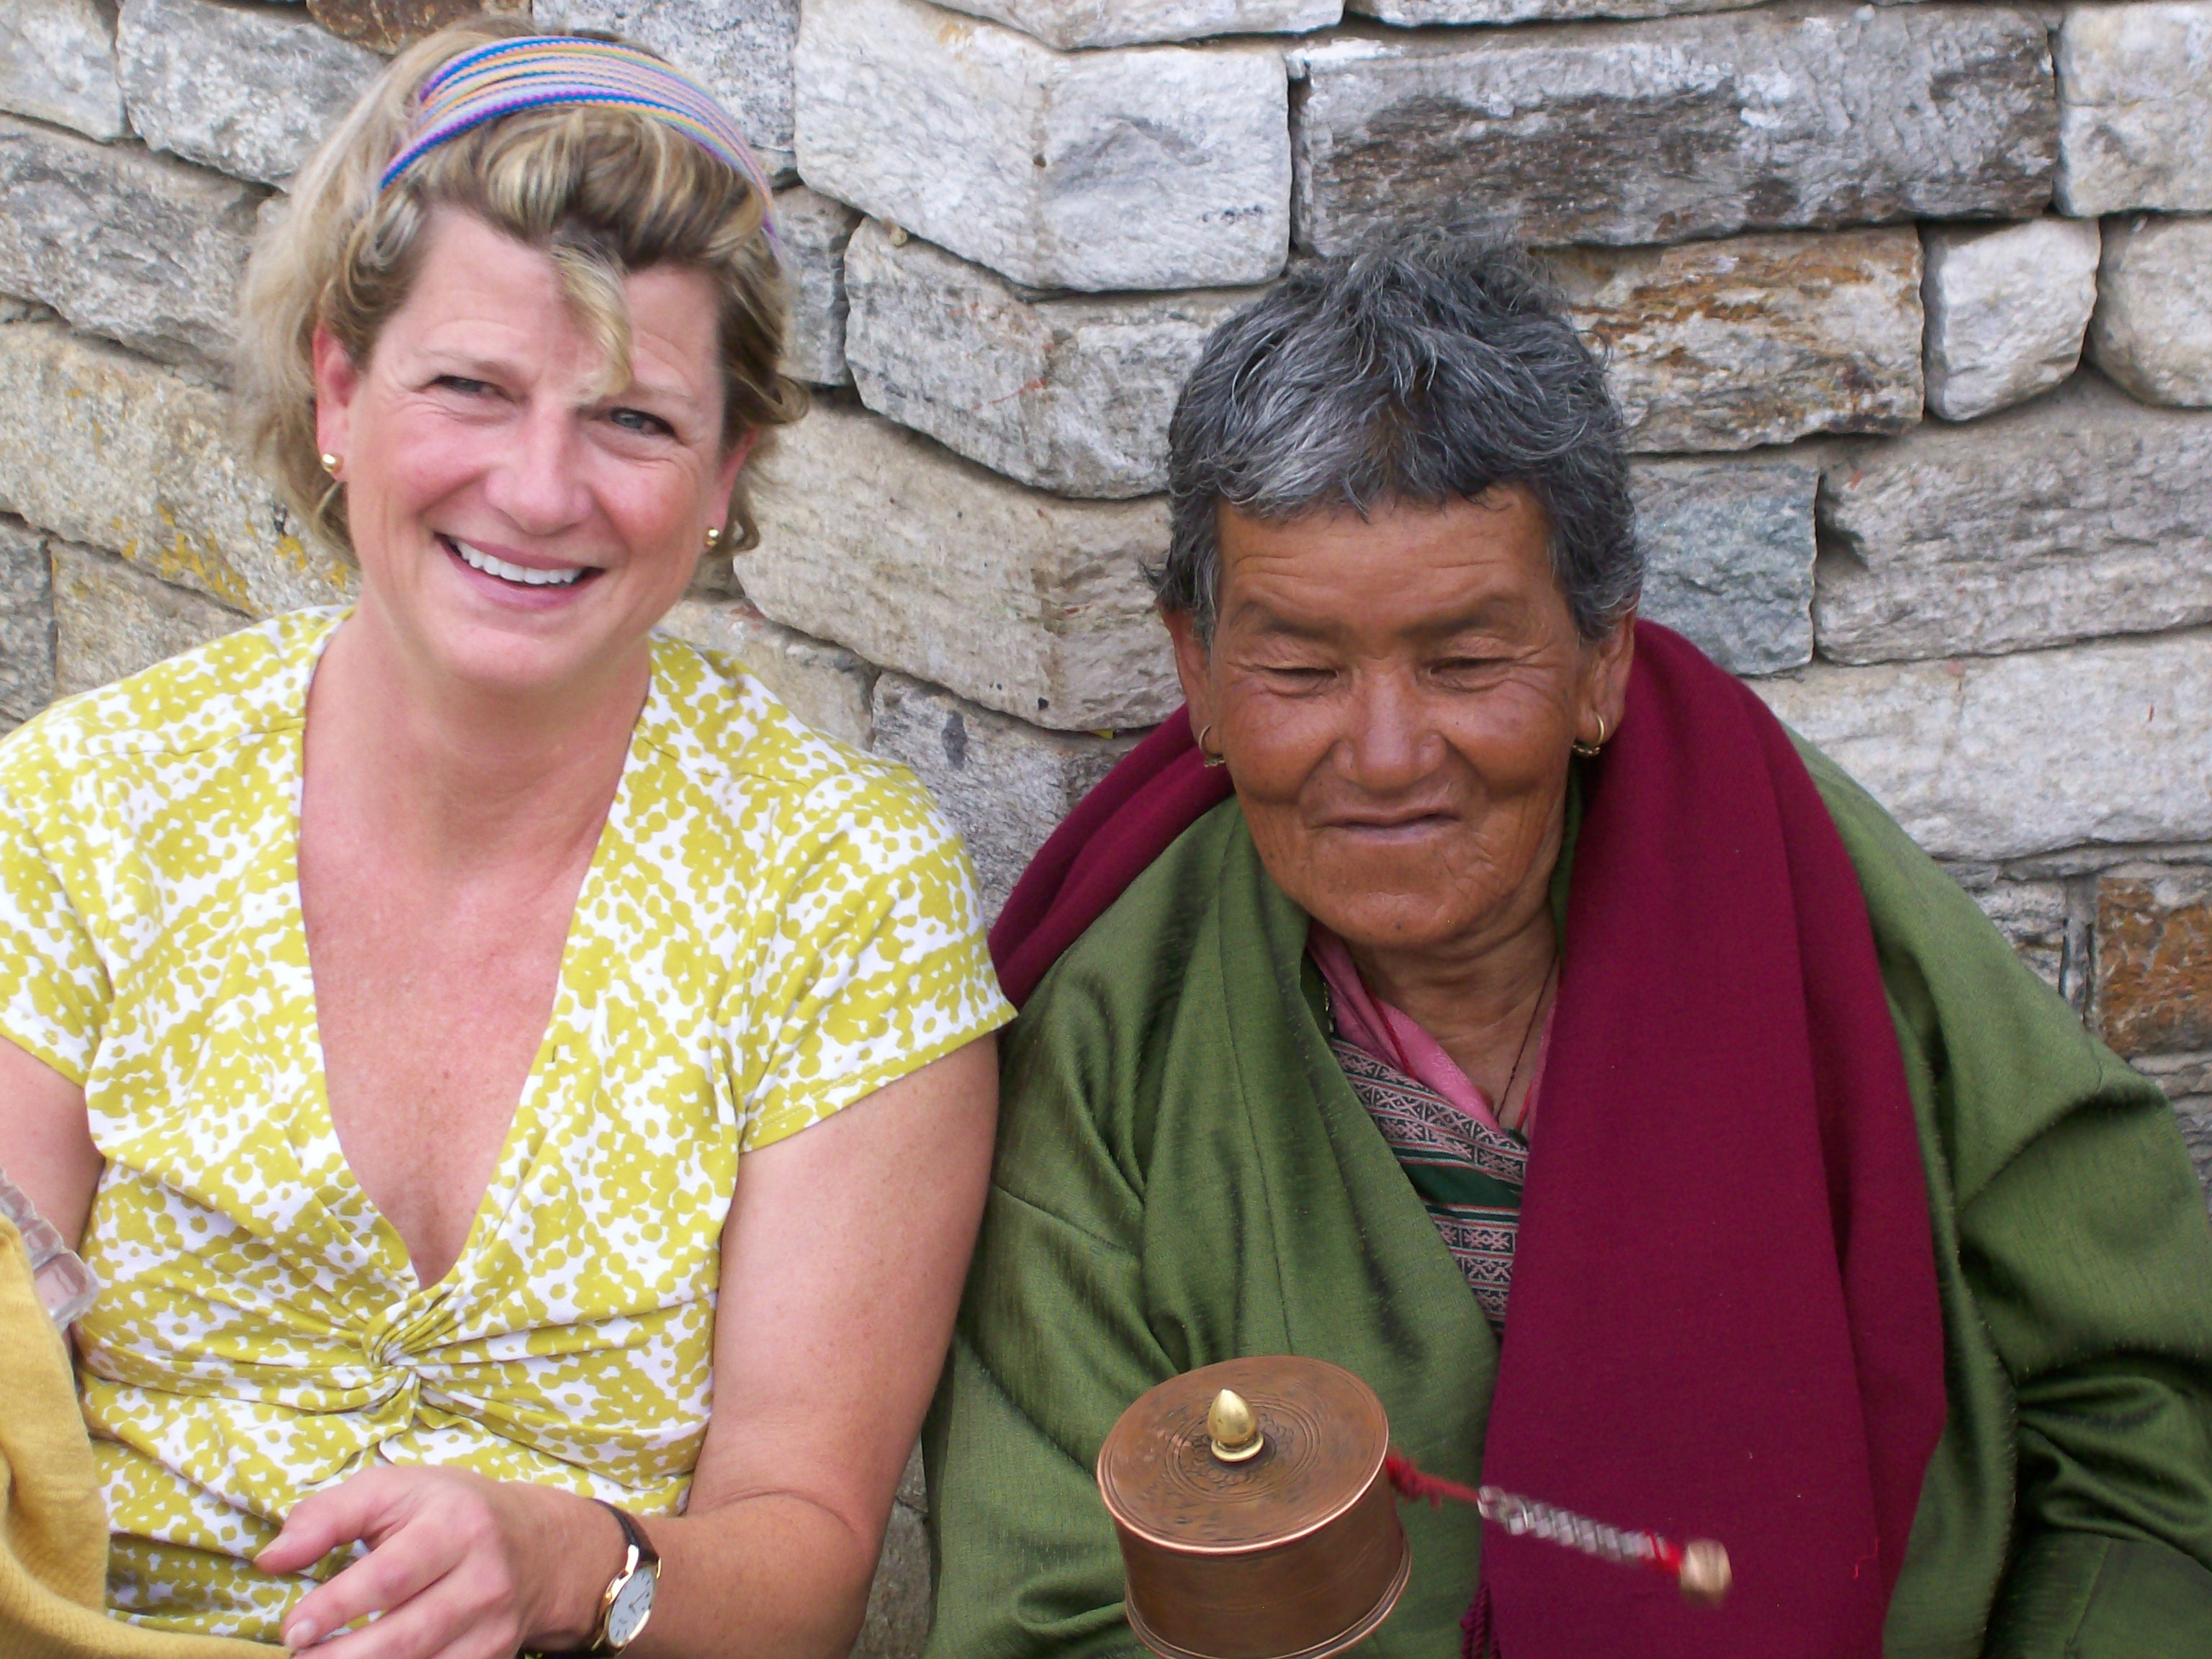 Marianne and Bhutanese woman at National Memorial Chorten